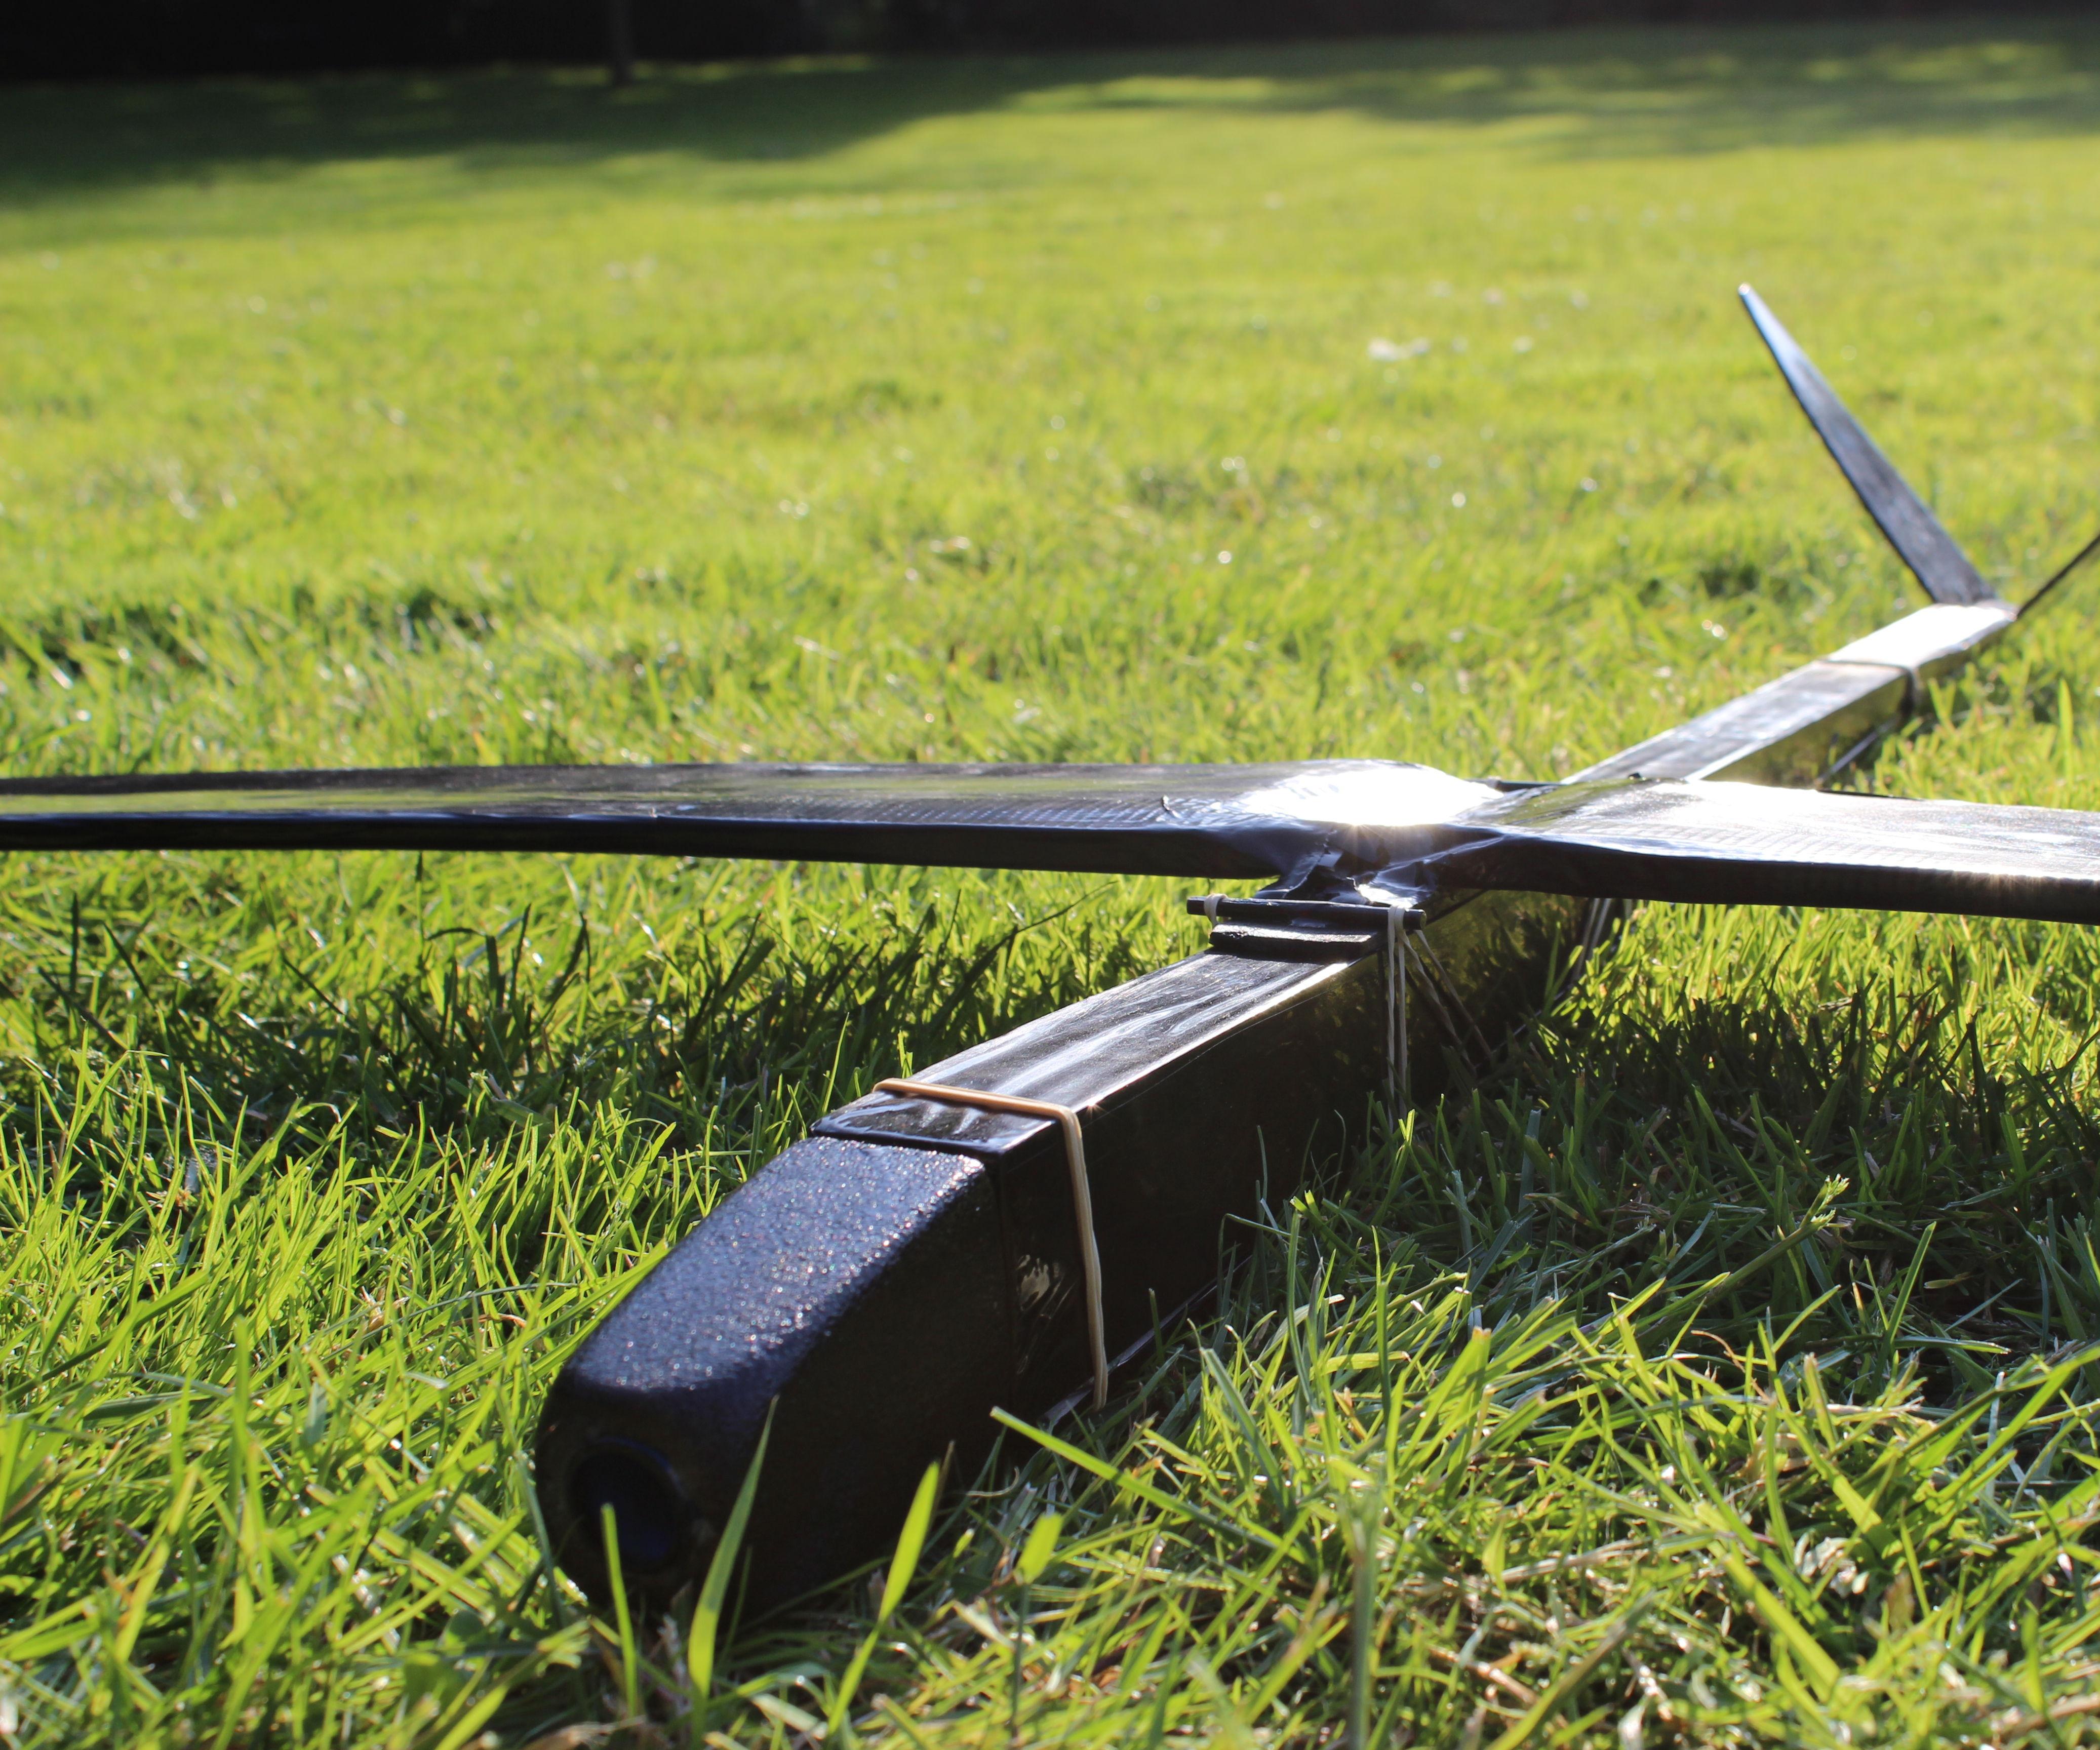 Glider 2m wingspan